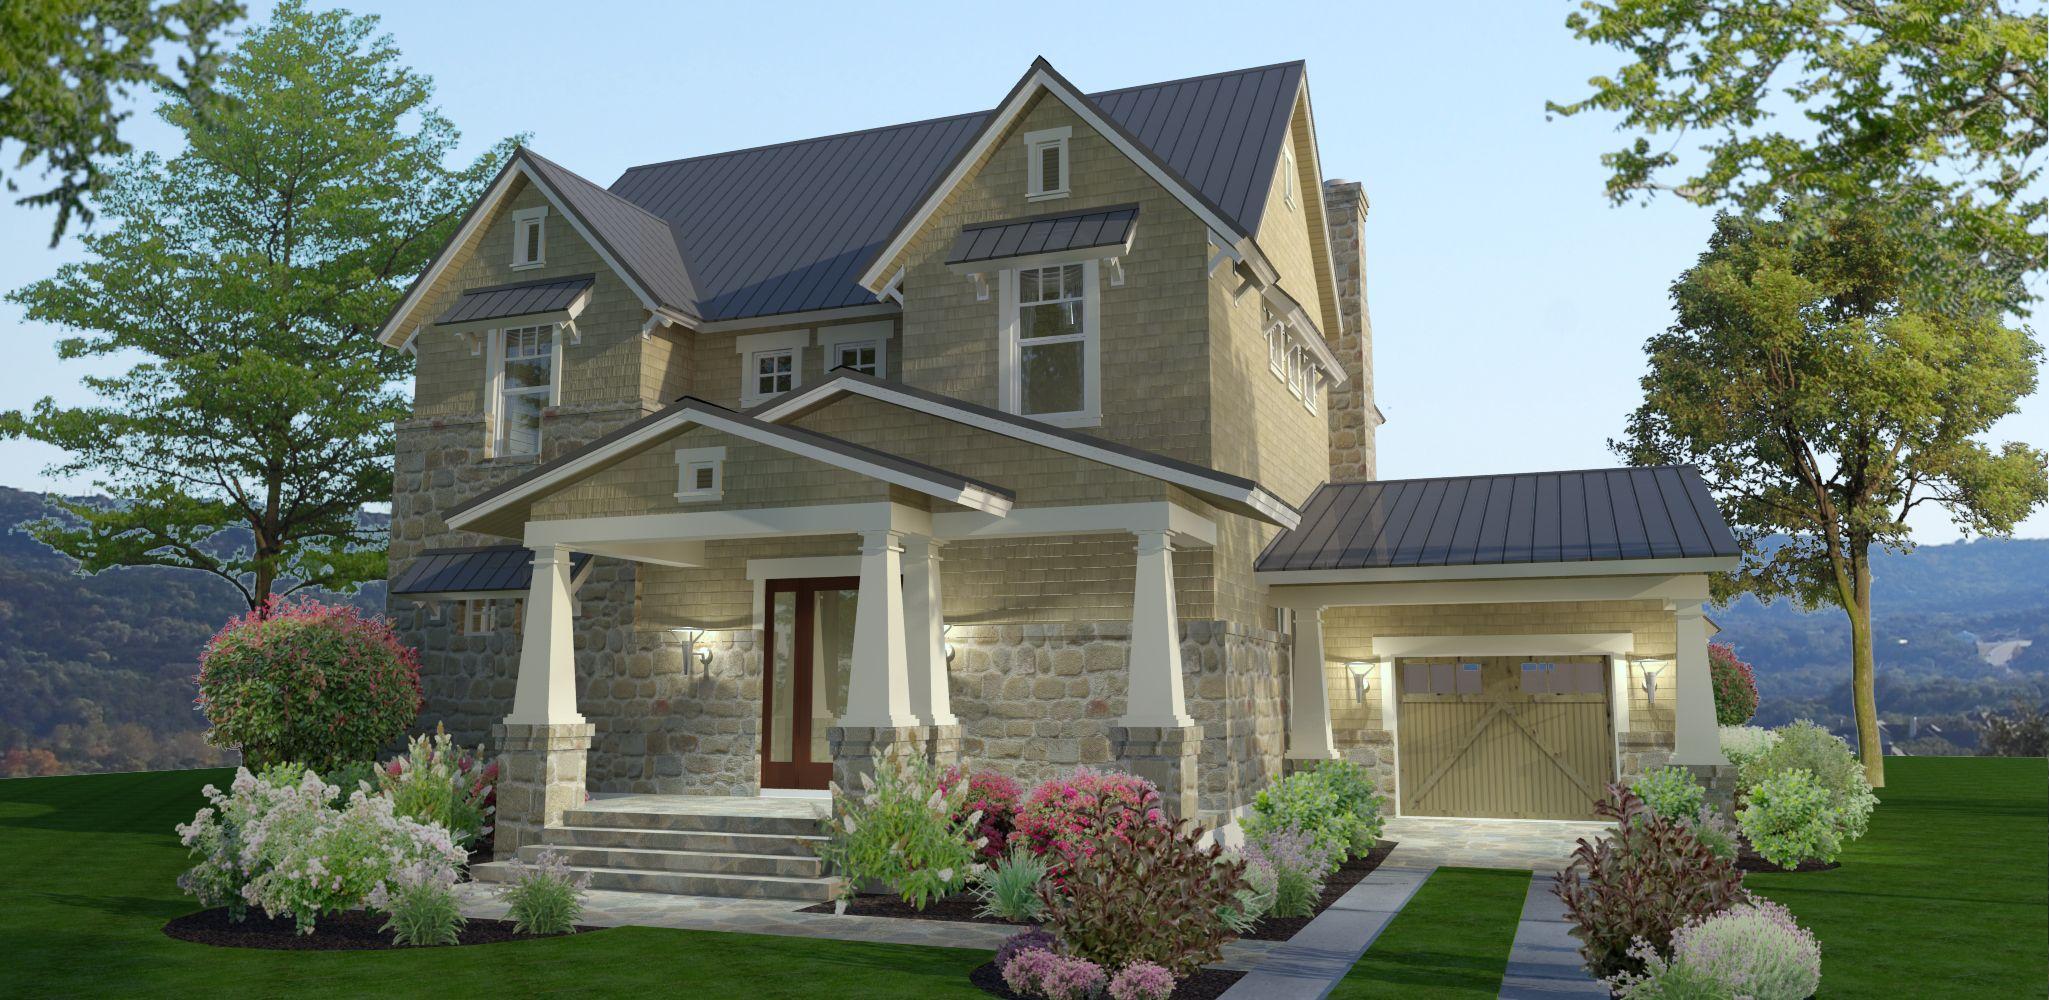 Plan 16891wg 3 bedroom stone farmhouse plan